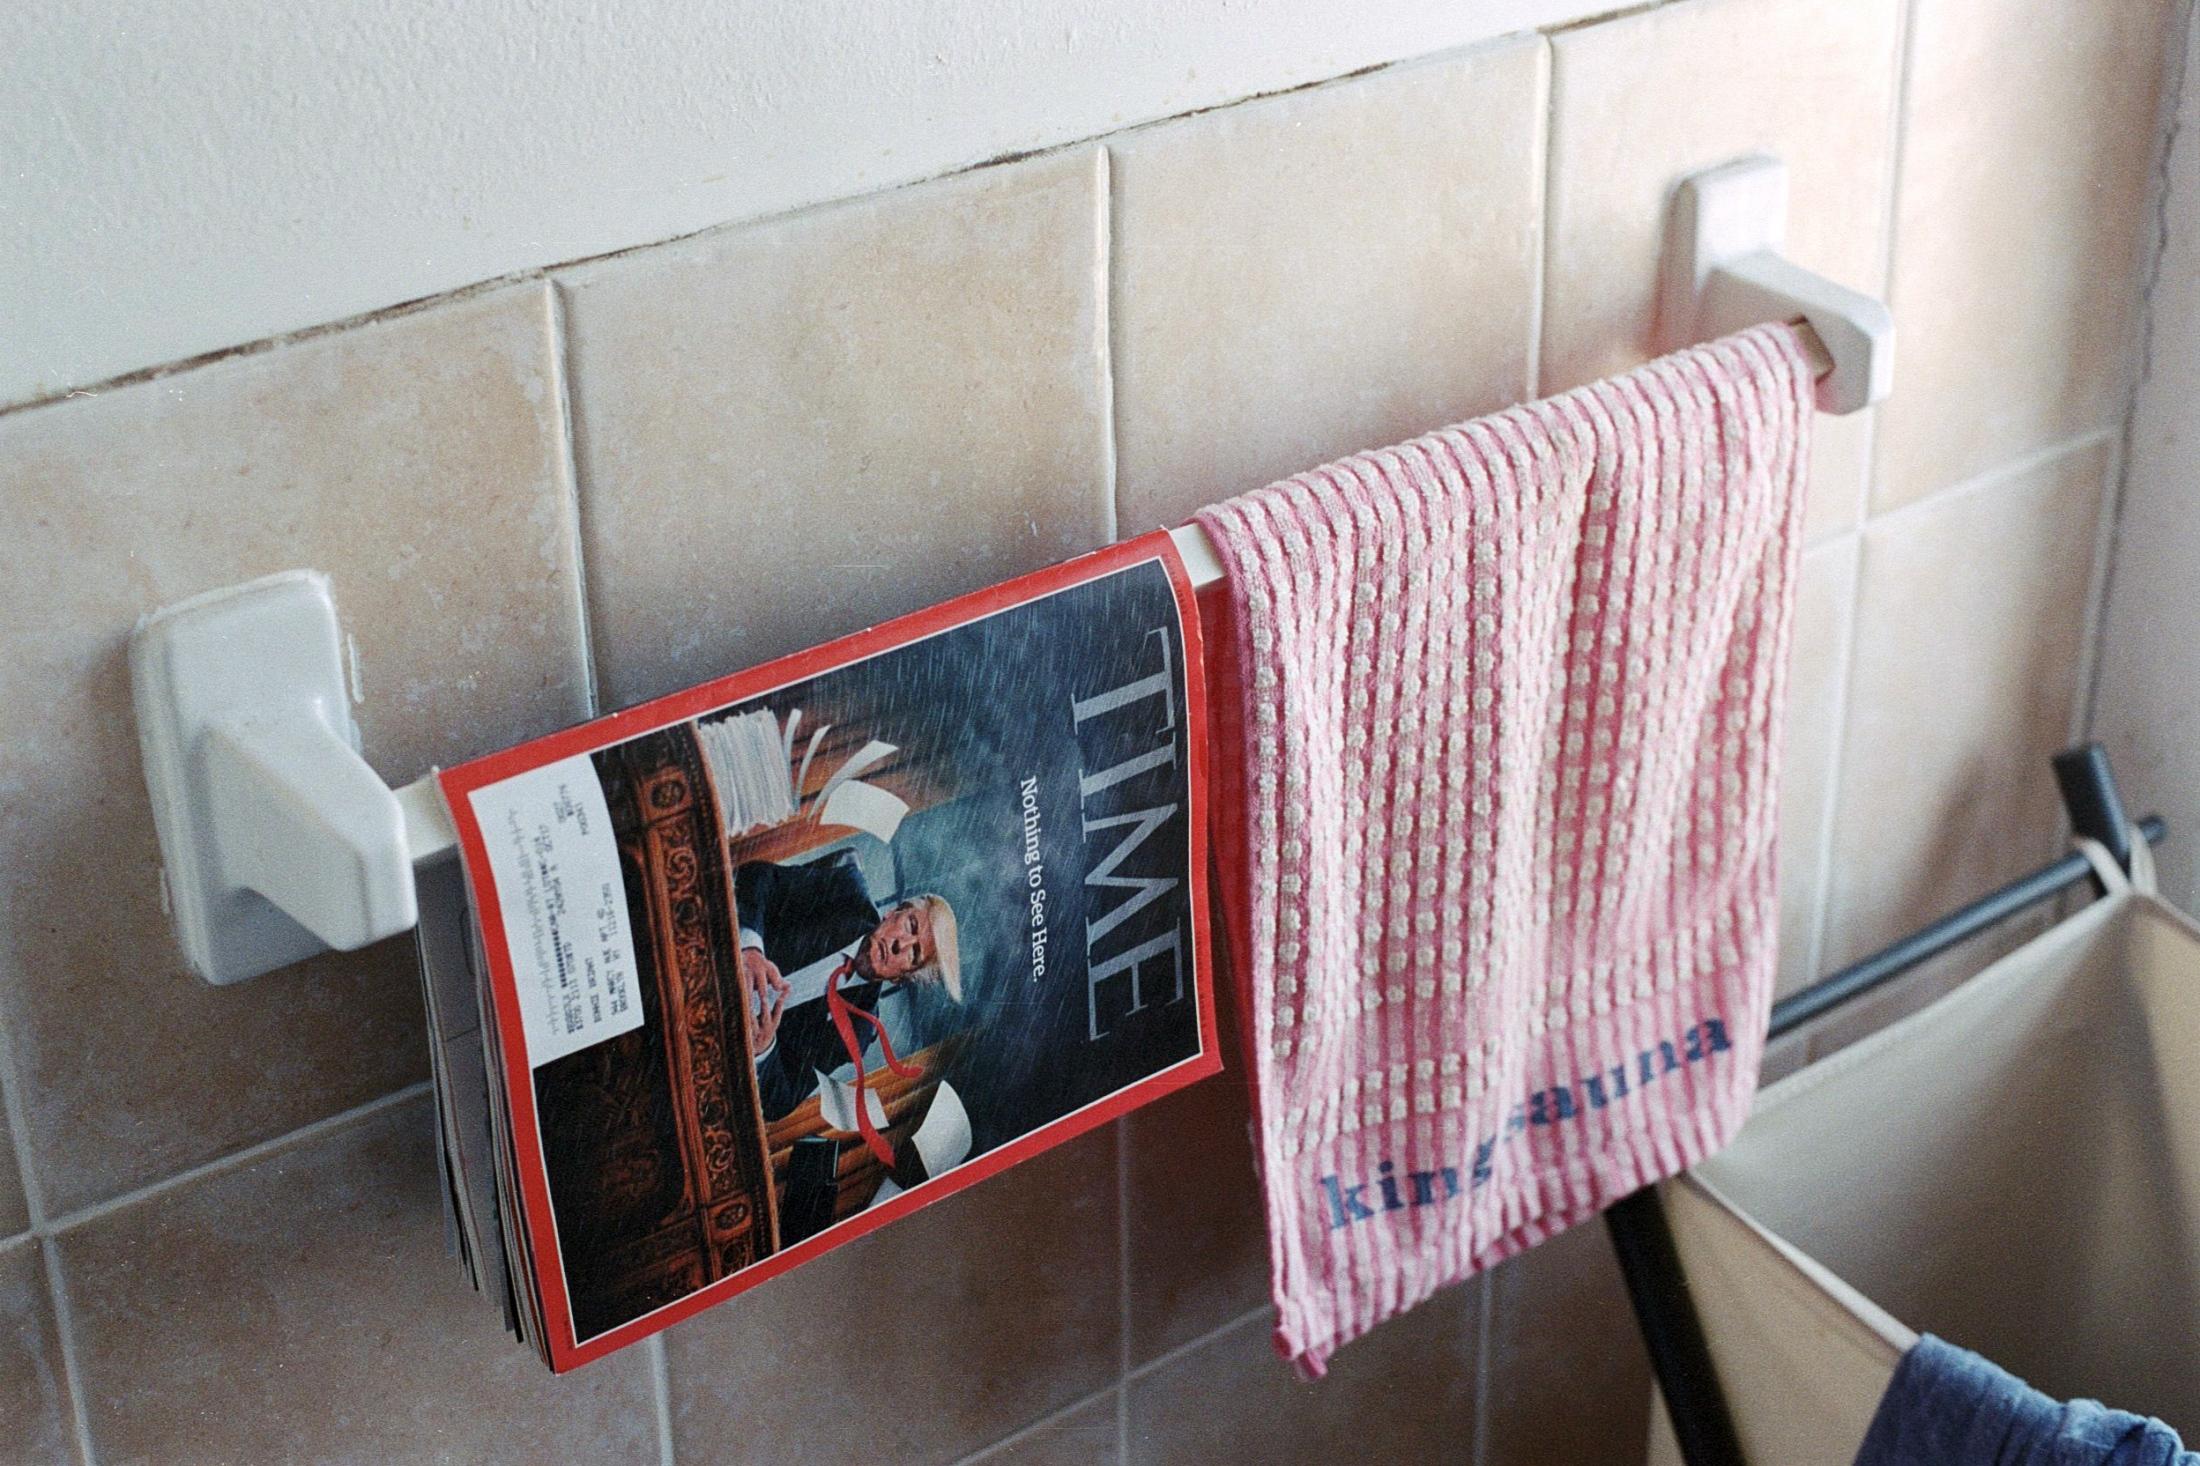 Time Magazine in my bathroom, New York, NY